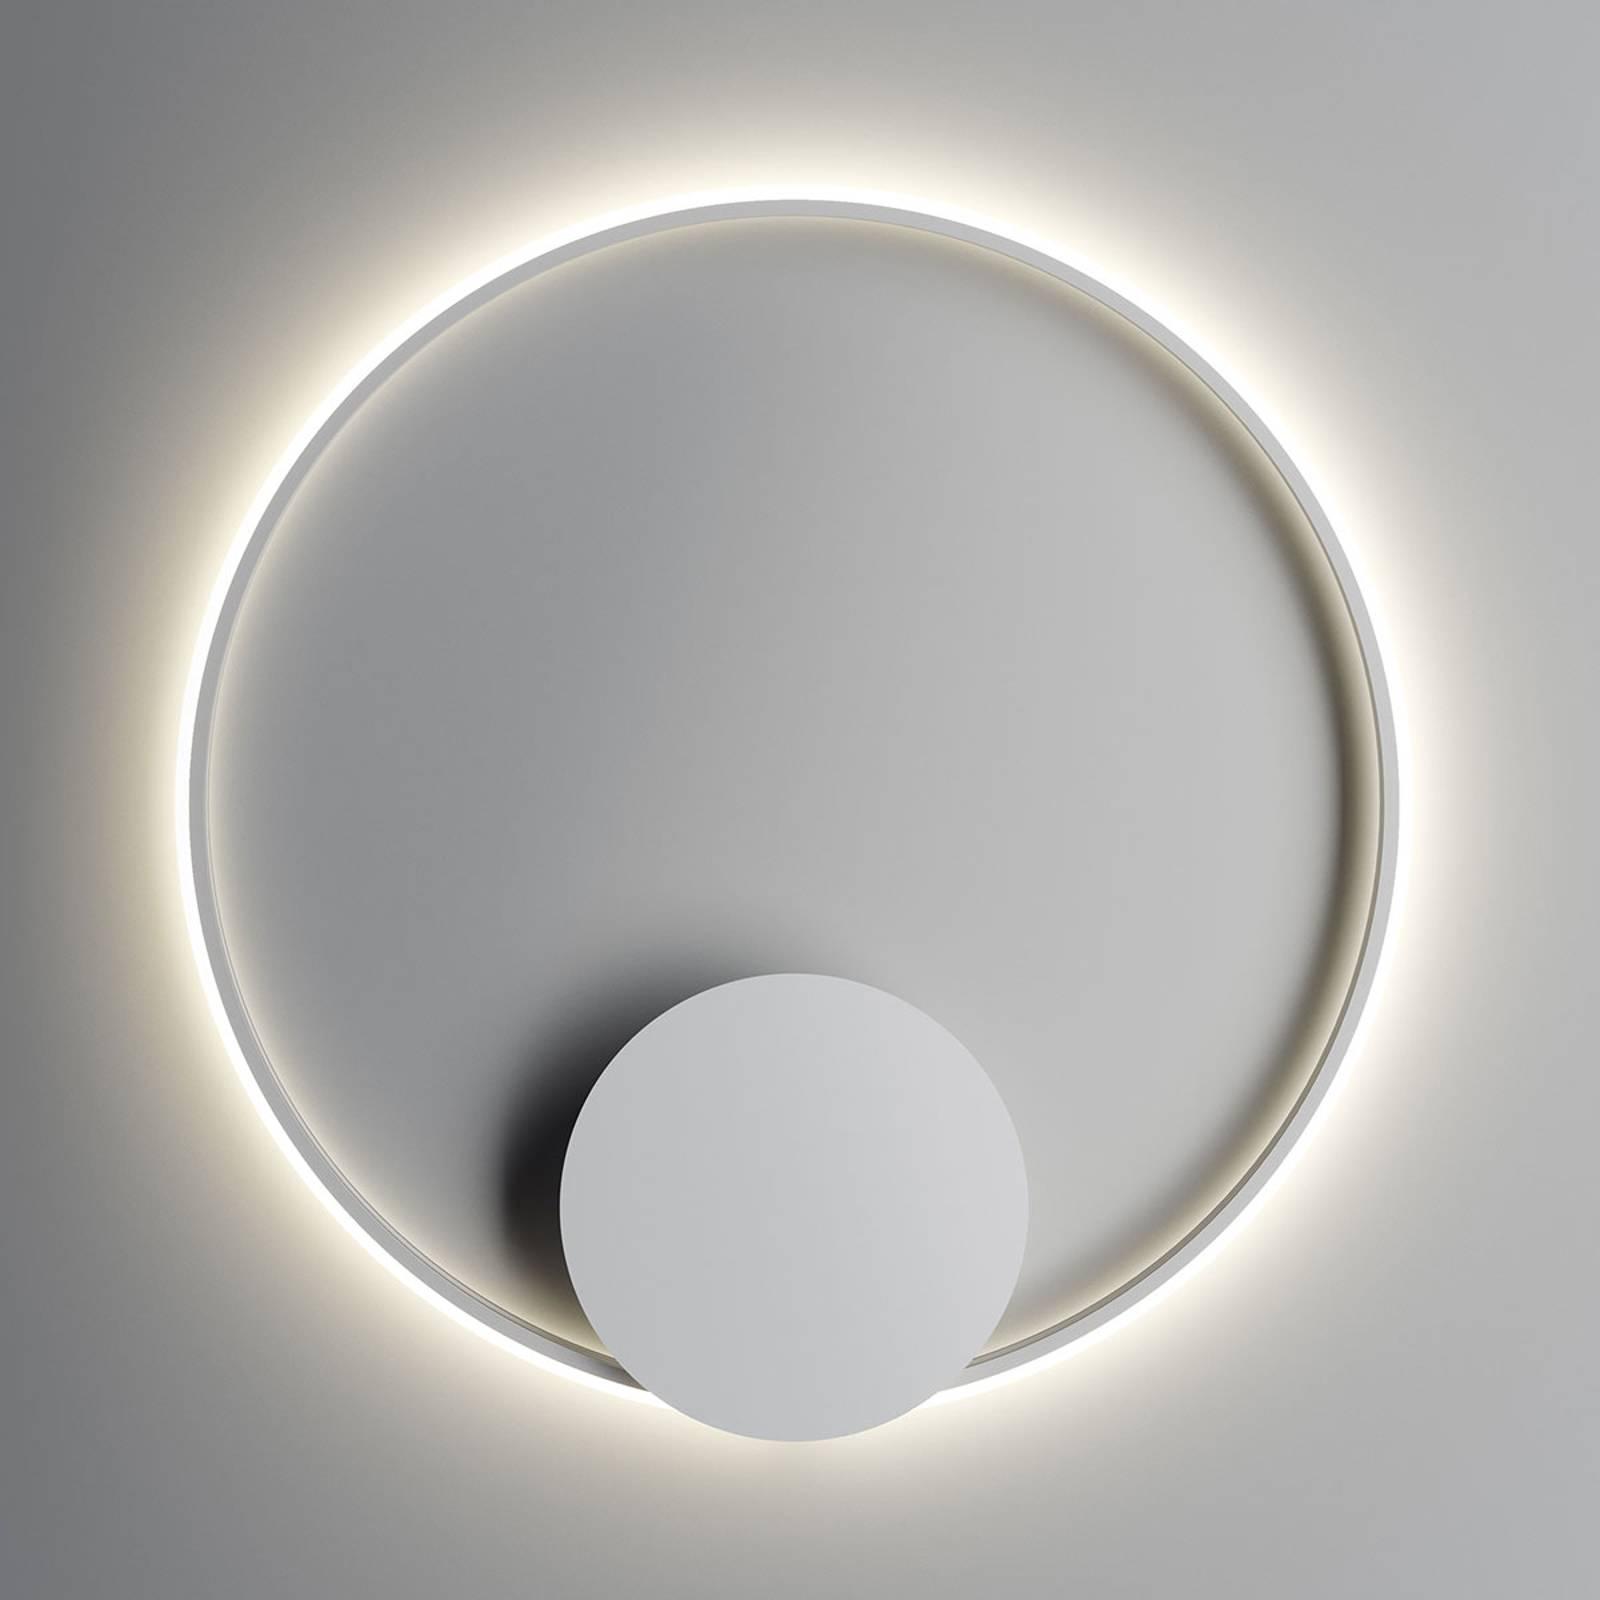 Fabbian Olympic LED-Wandleuchte Ø 80 cm weiß